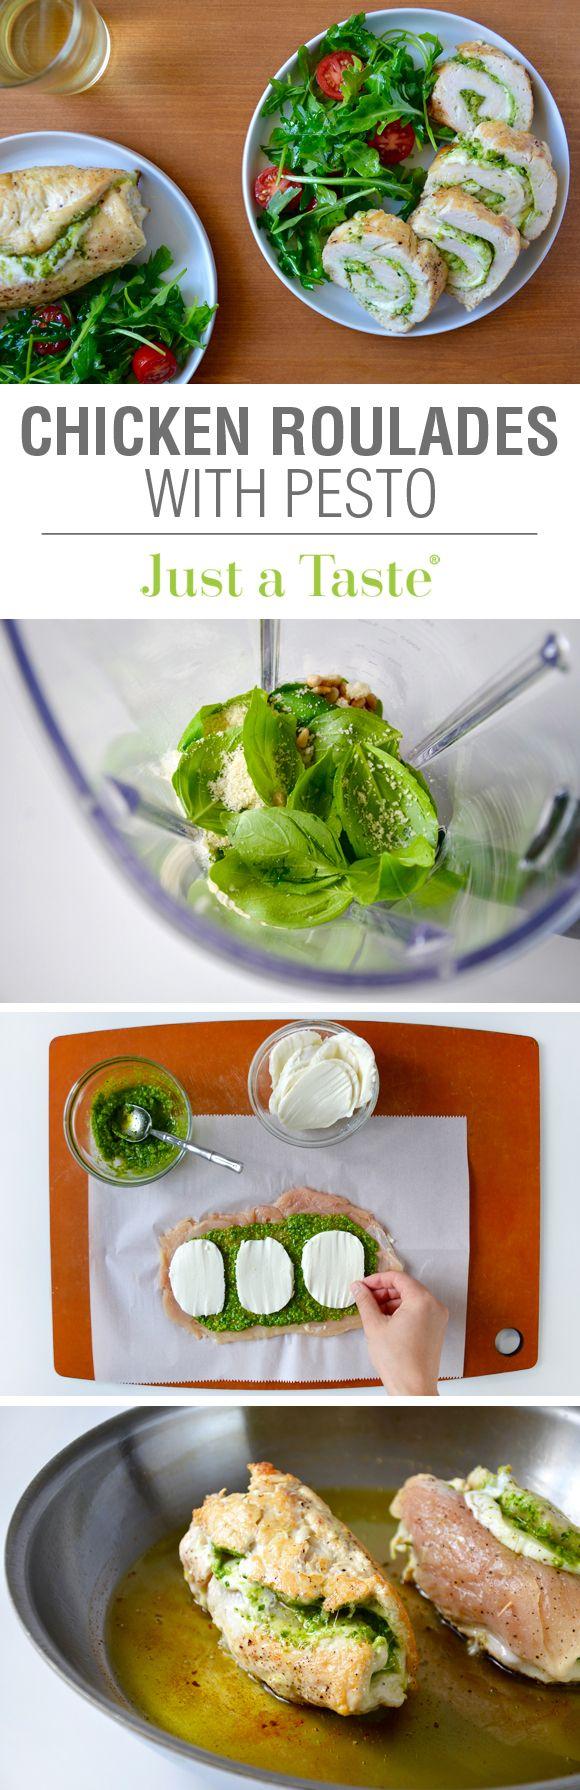 Cheesy Chicken Roulades with Pesto #recipe via justataste.com